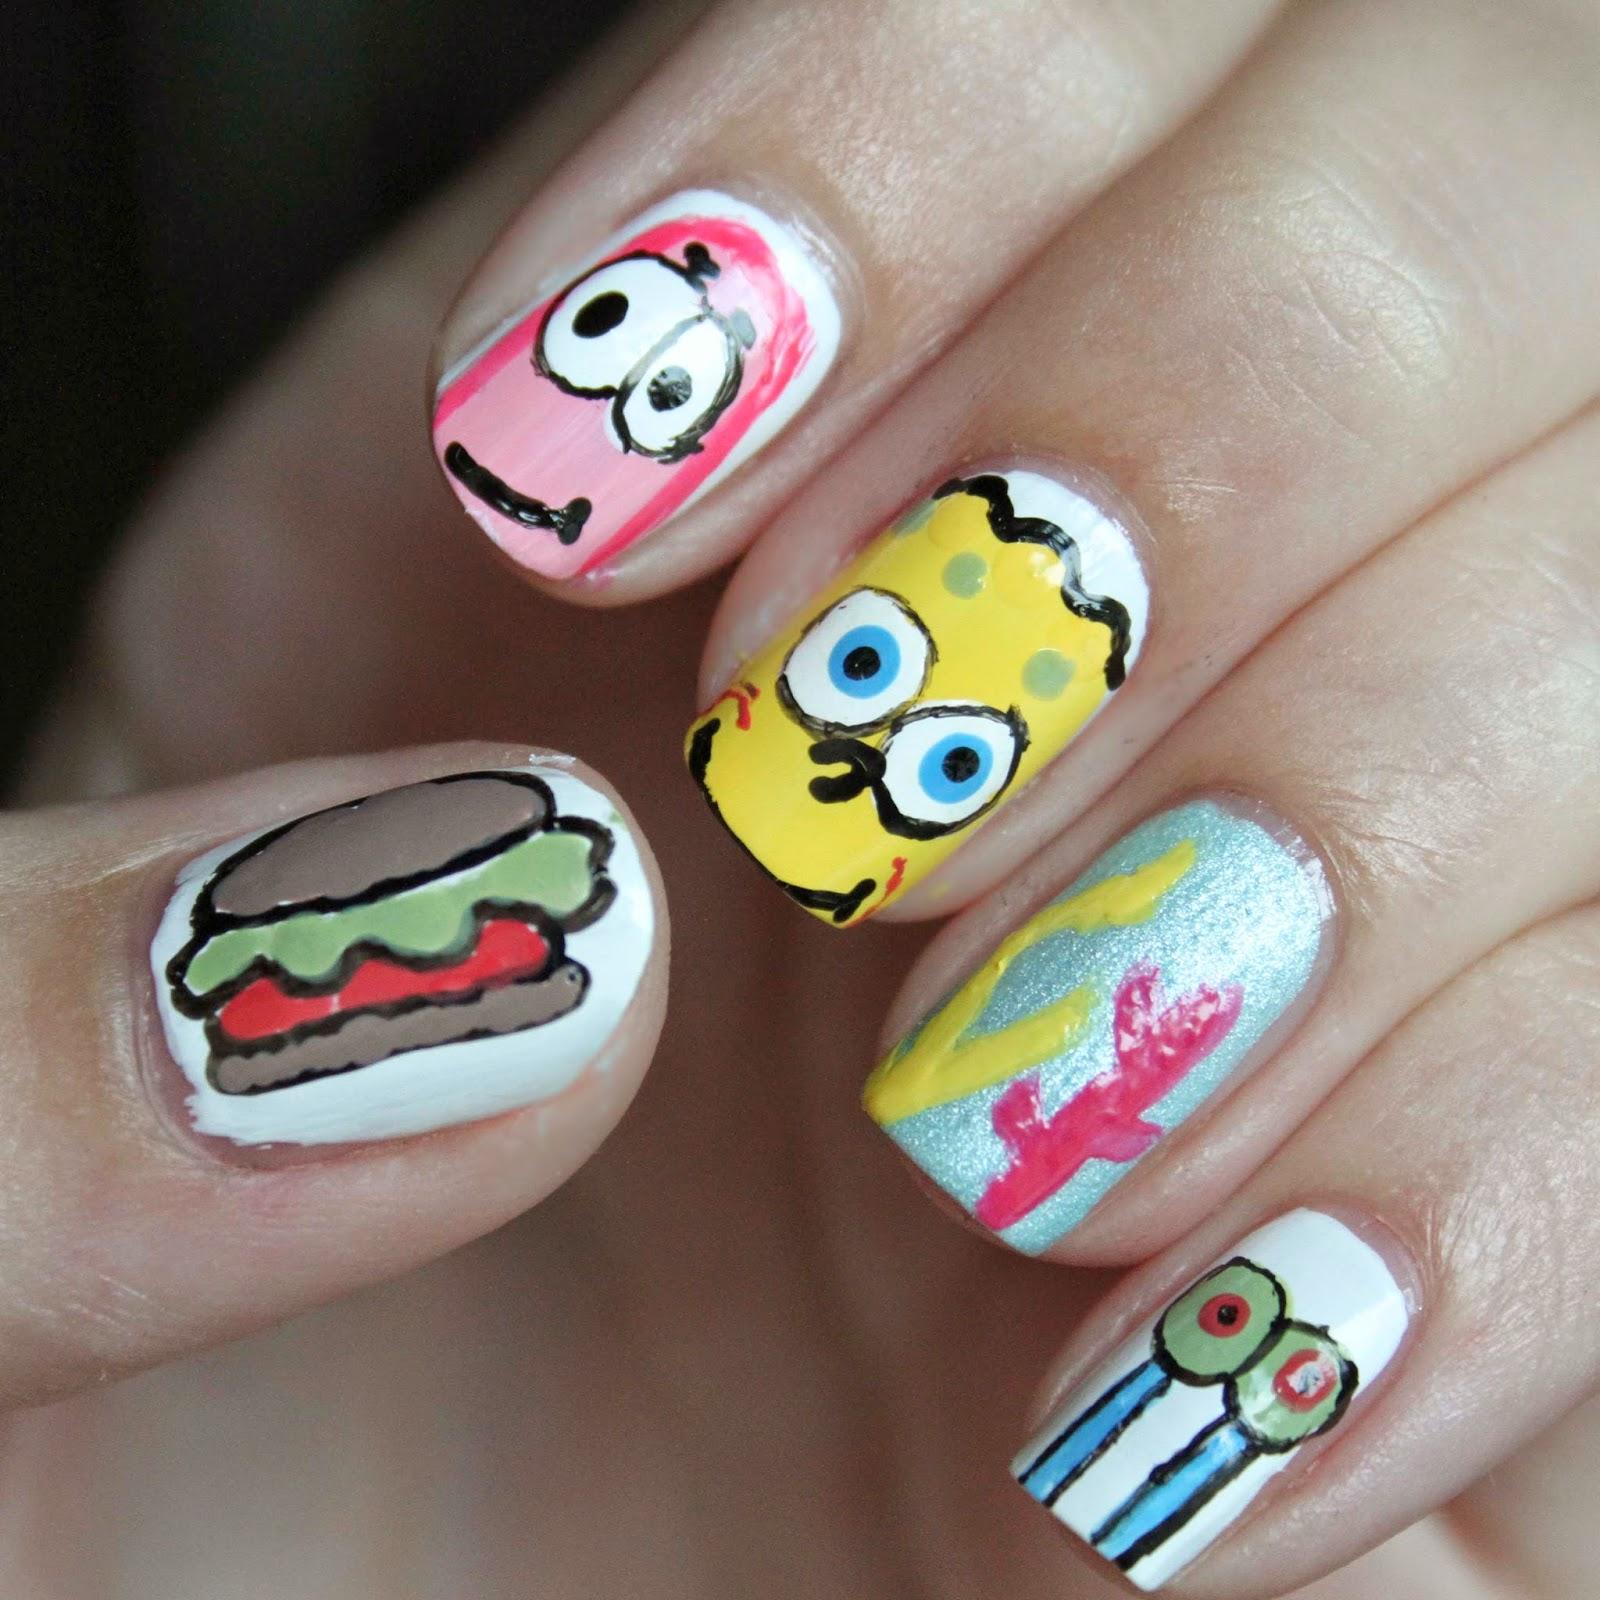 Elaine Nails Spongebob Nail Art